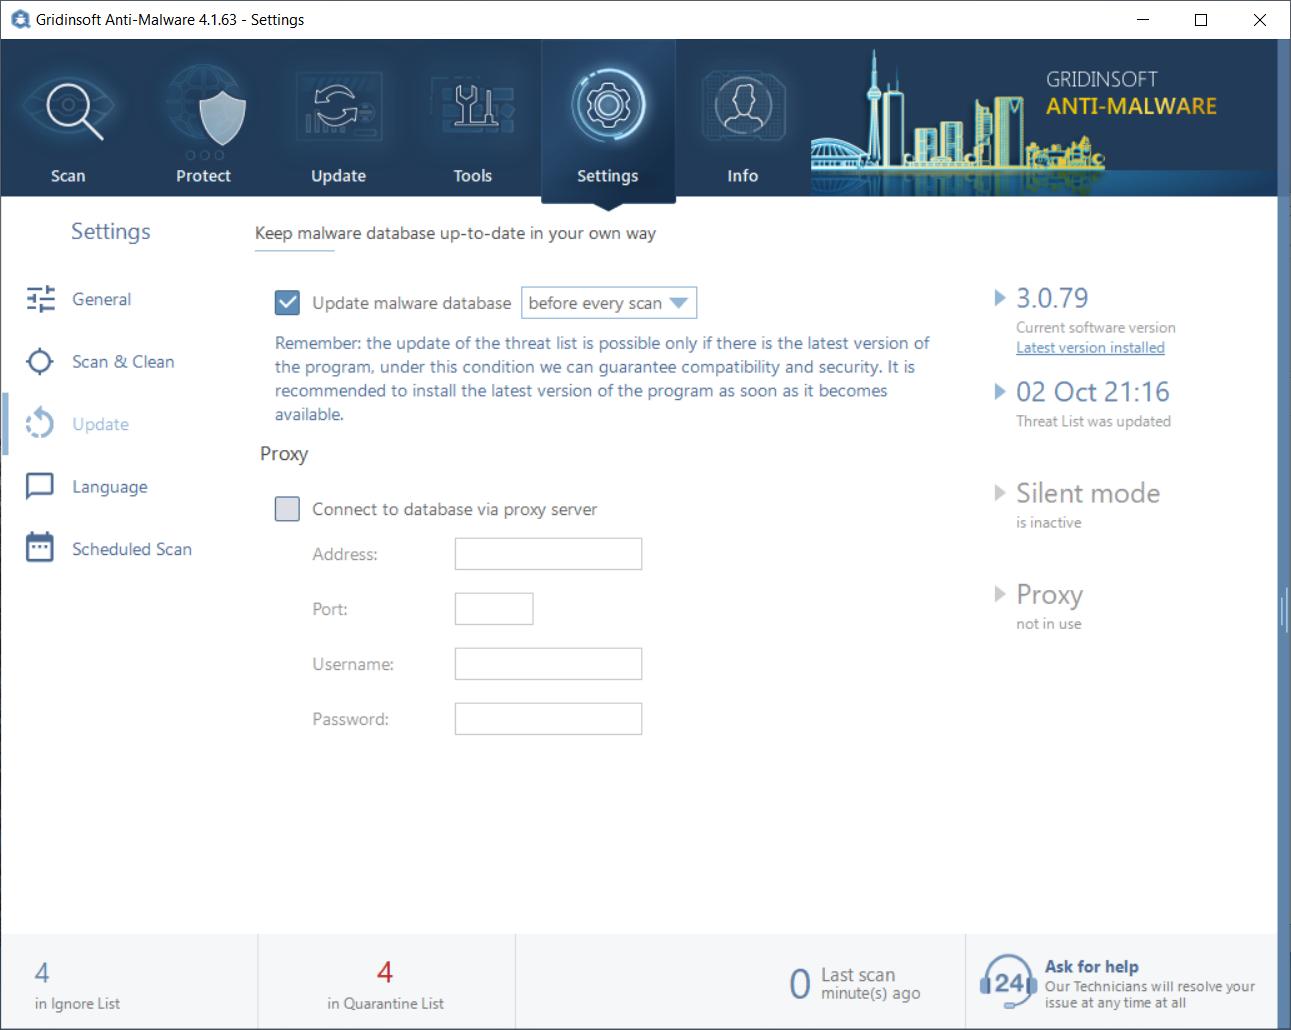 Update settings in GridinSoft Anti-Malware